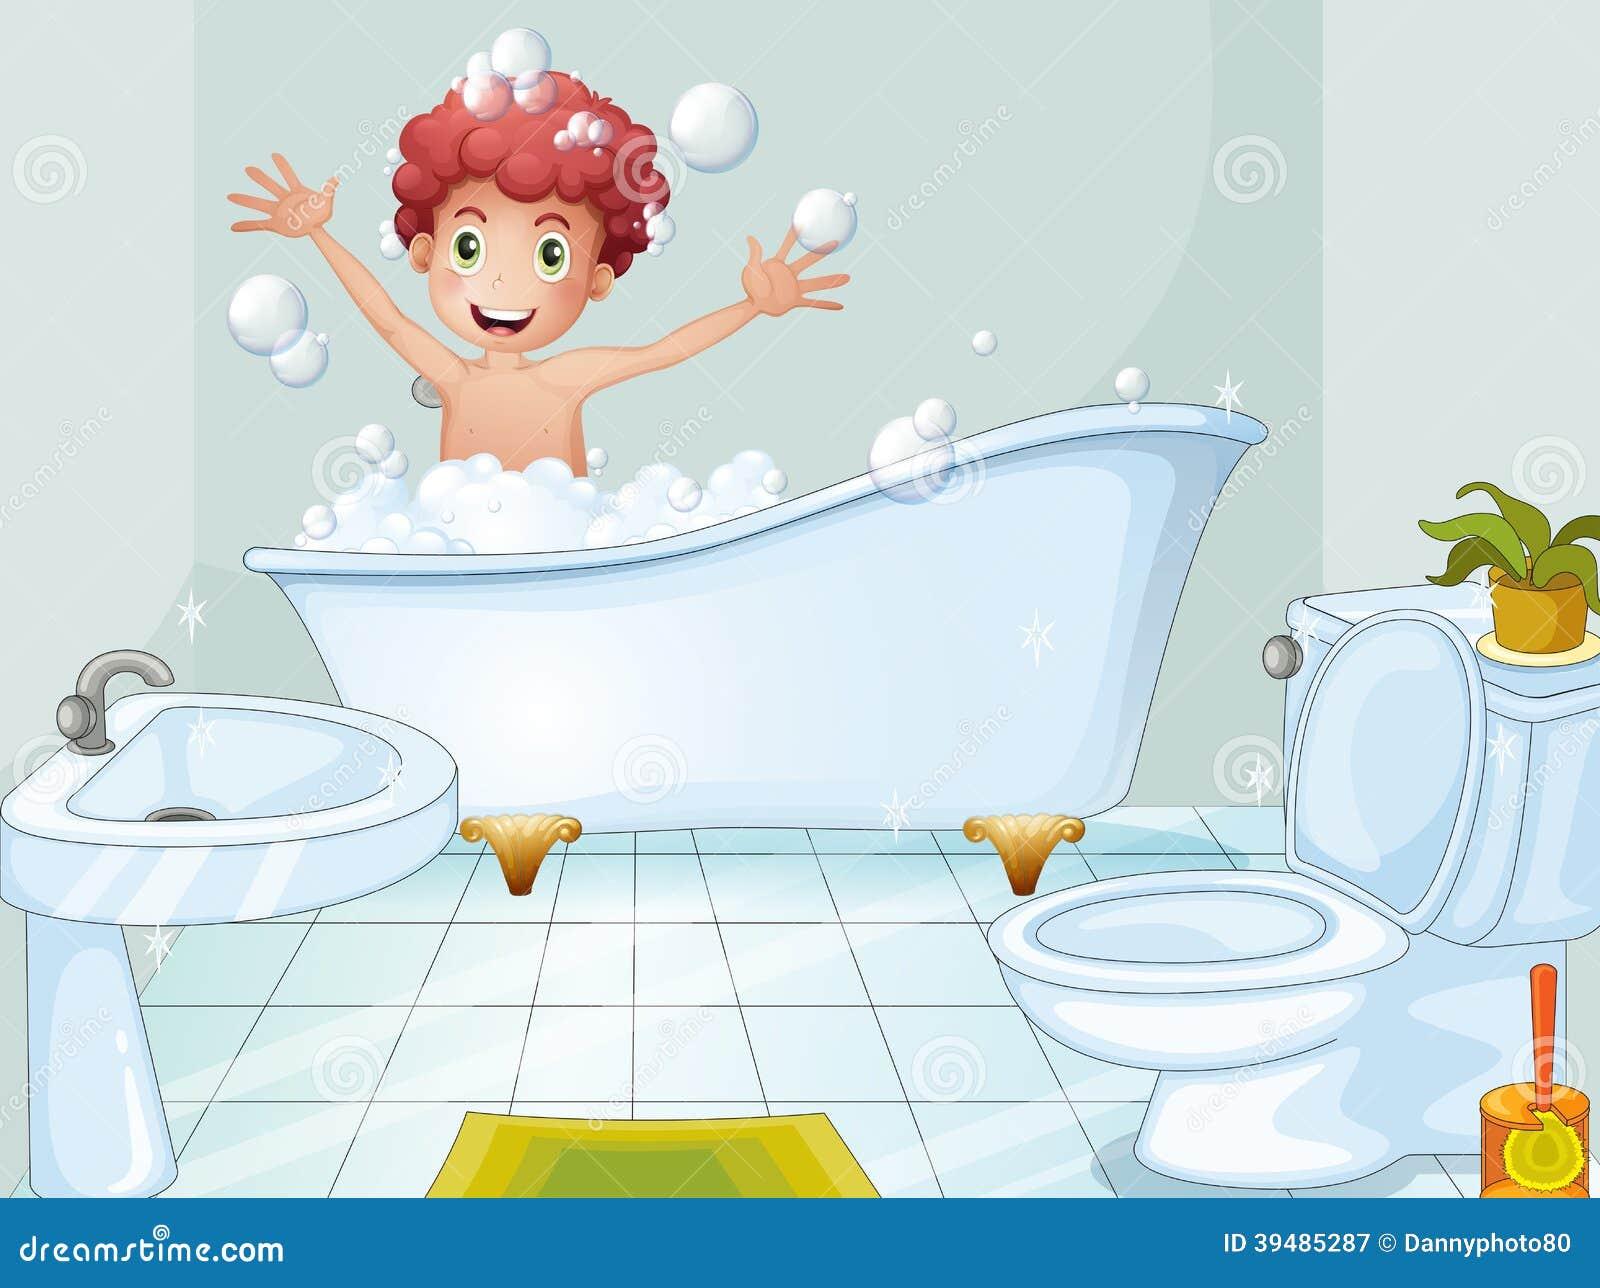 Cute Cartoon Boy Bathroom Stock Illustration 215566618